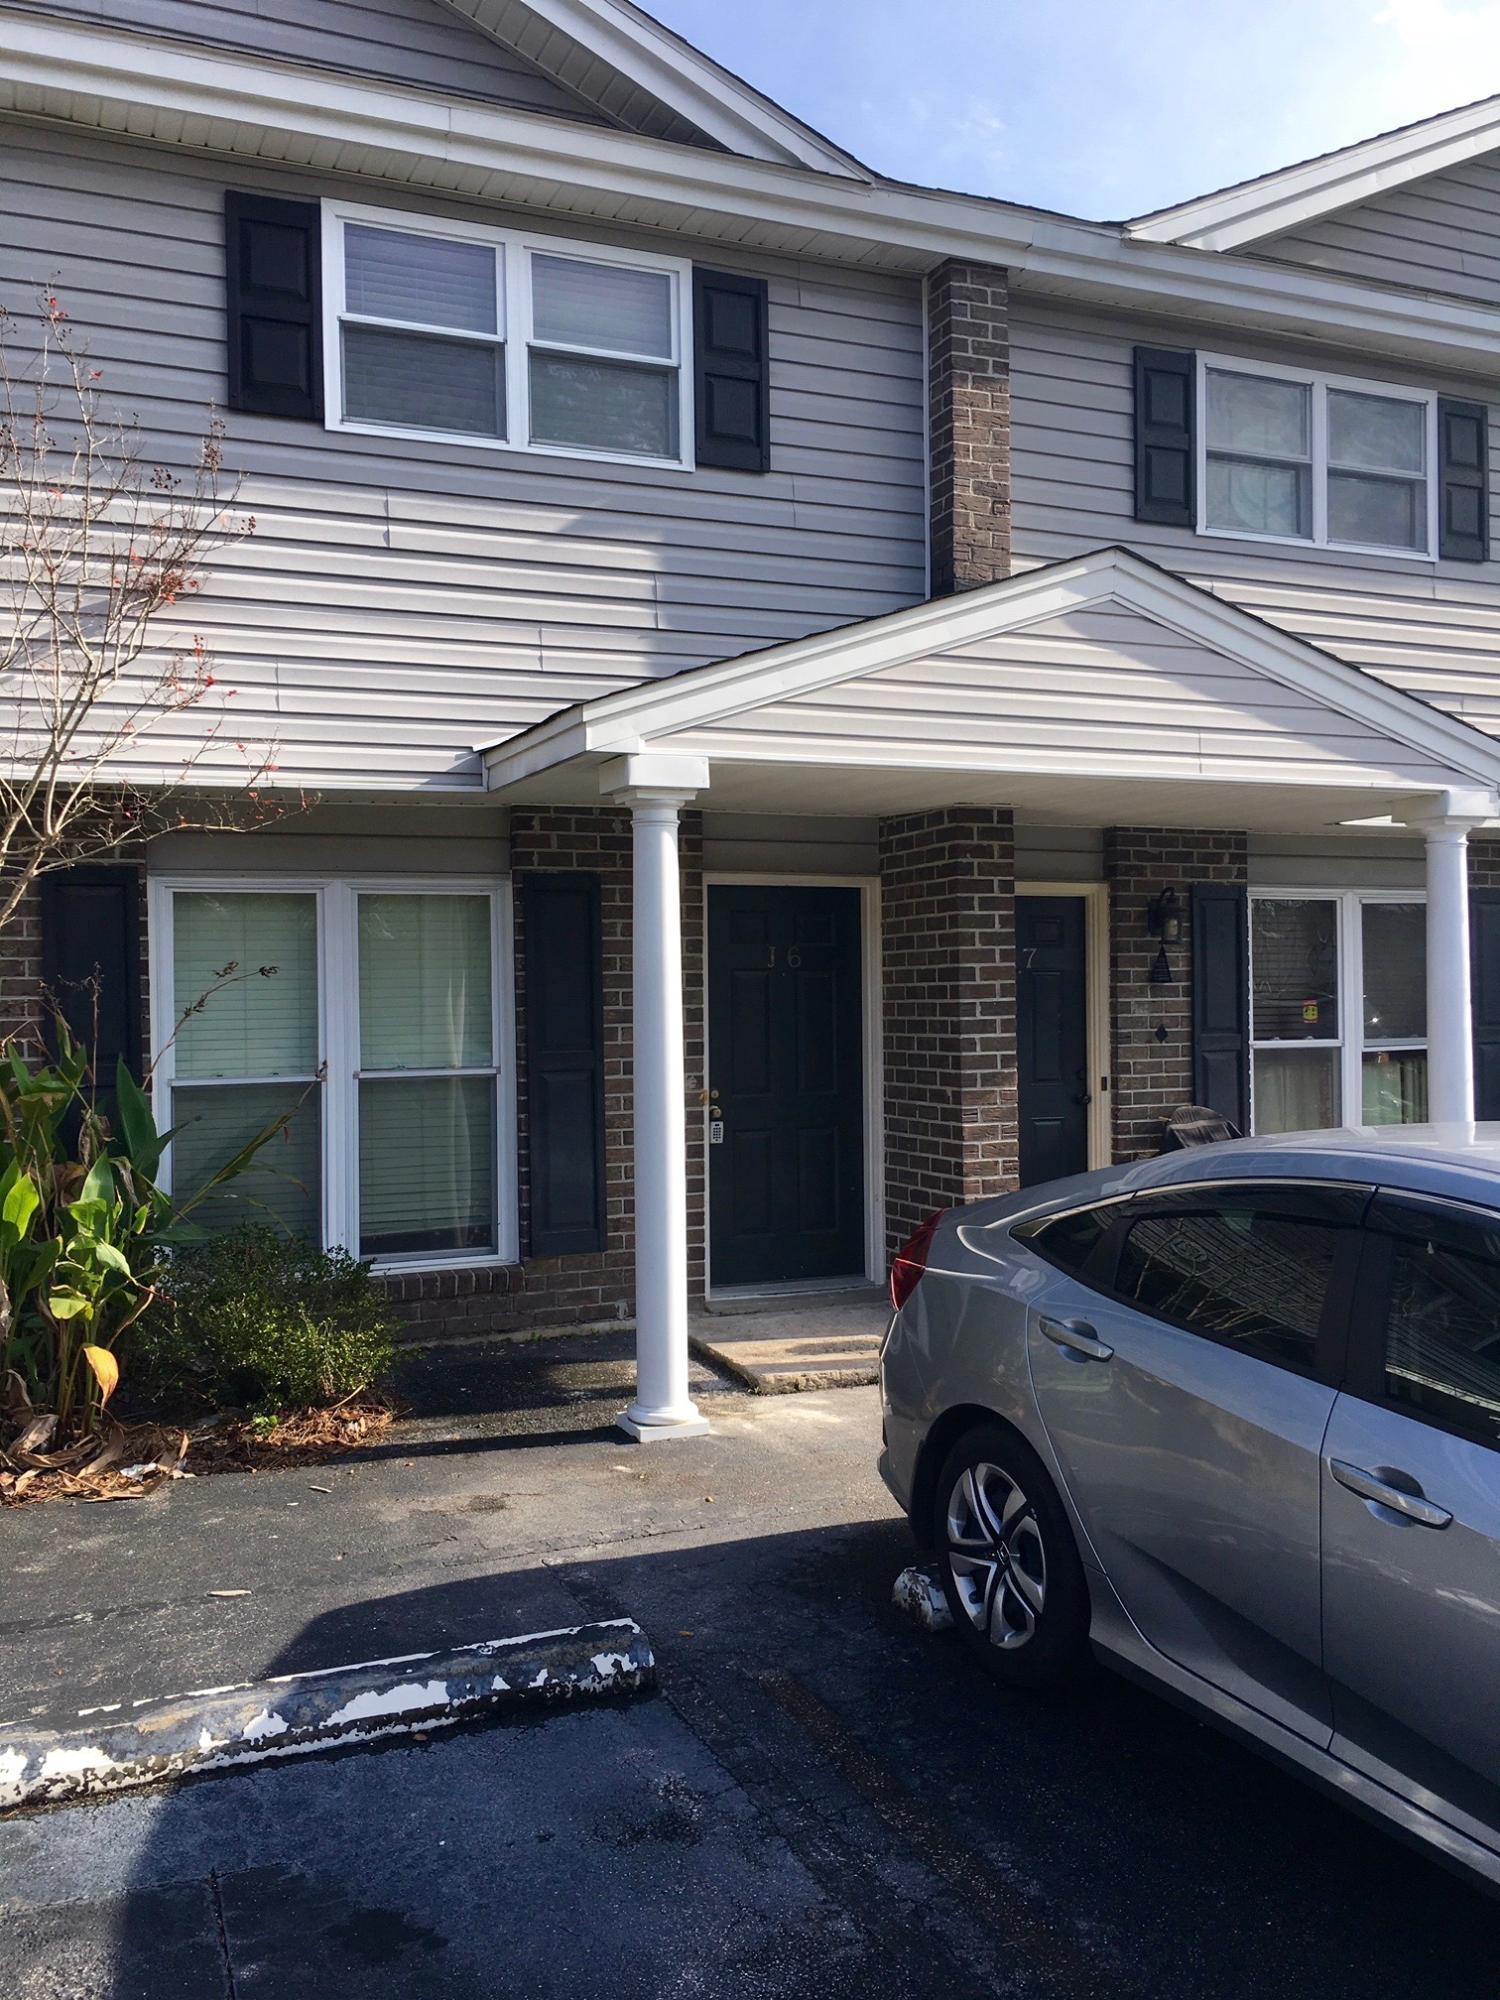 1721 #1095 Boone Hall Drive Charleston, Sc 29407